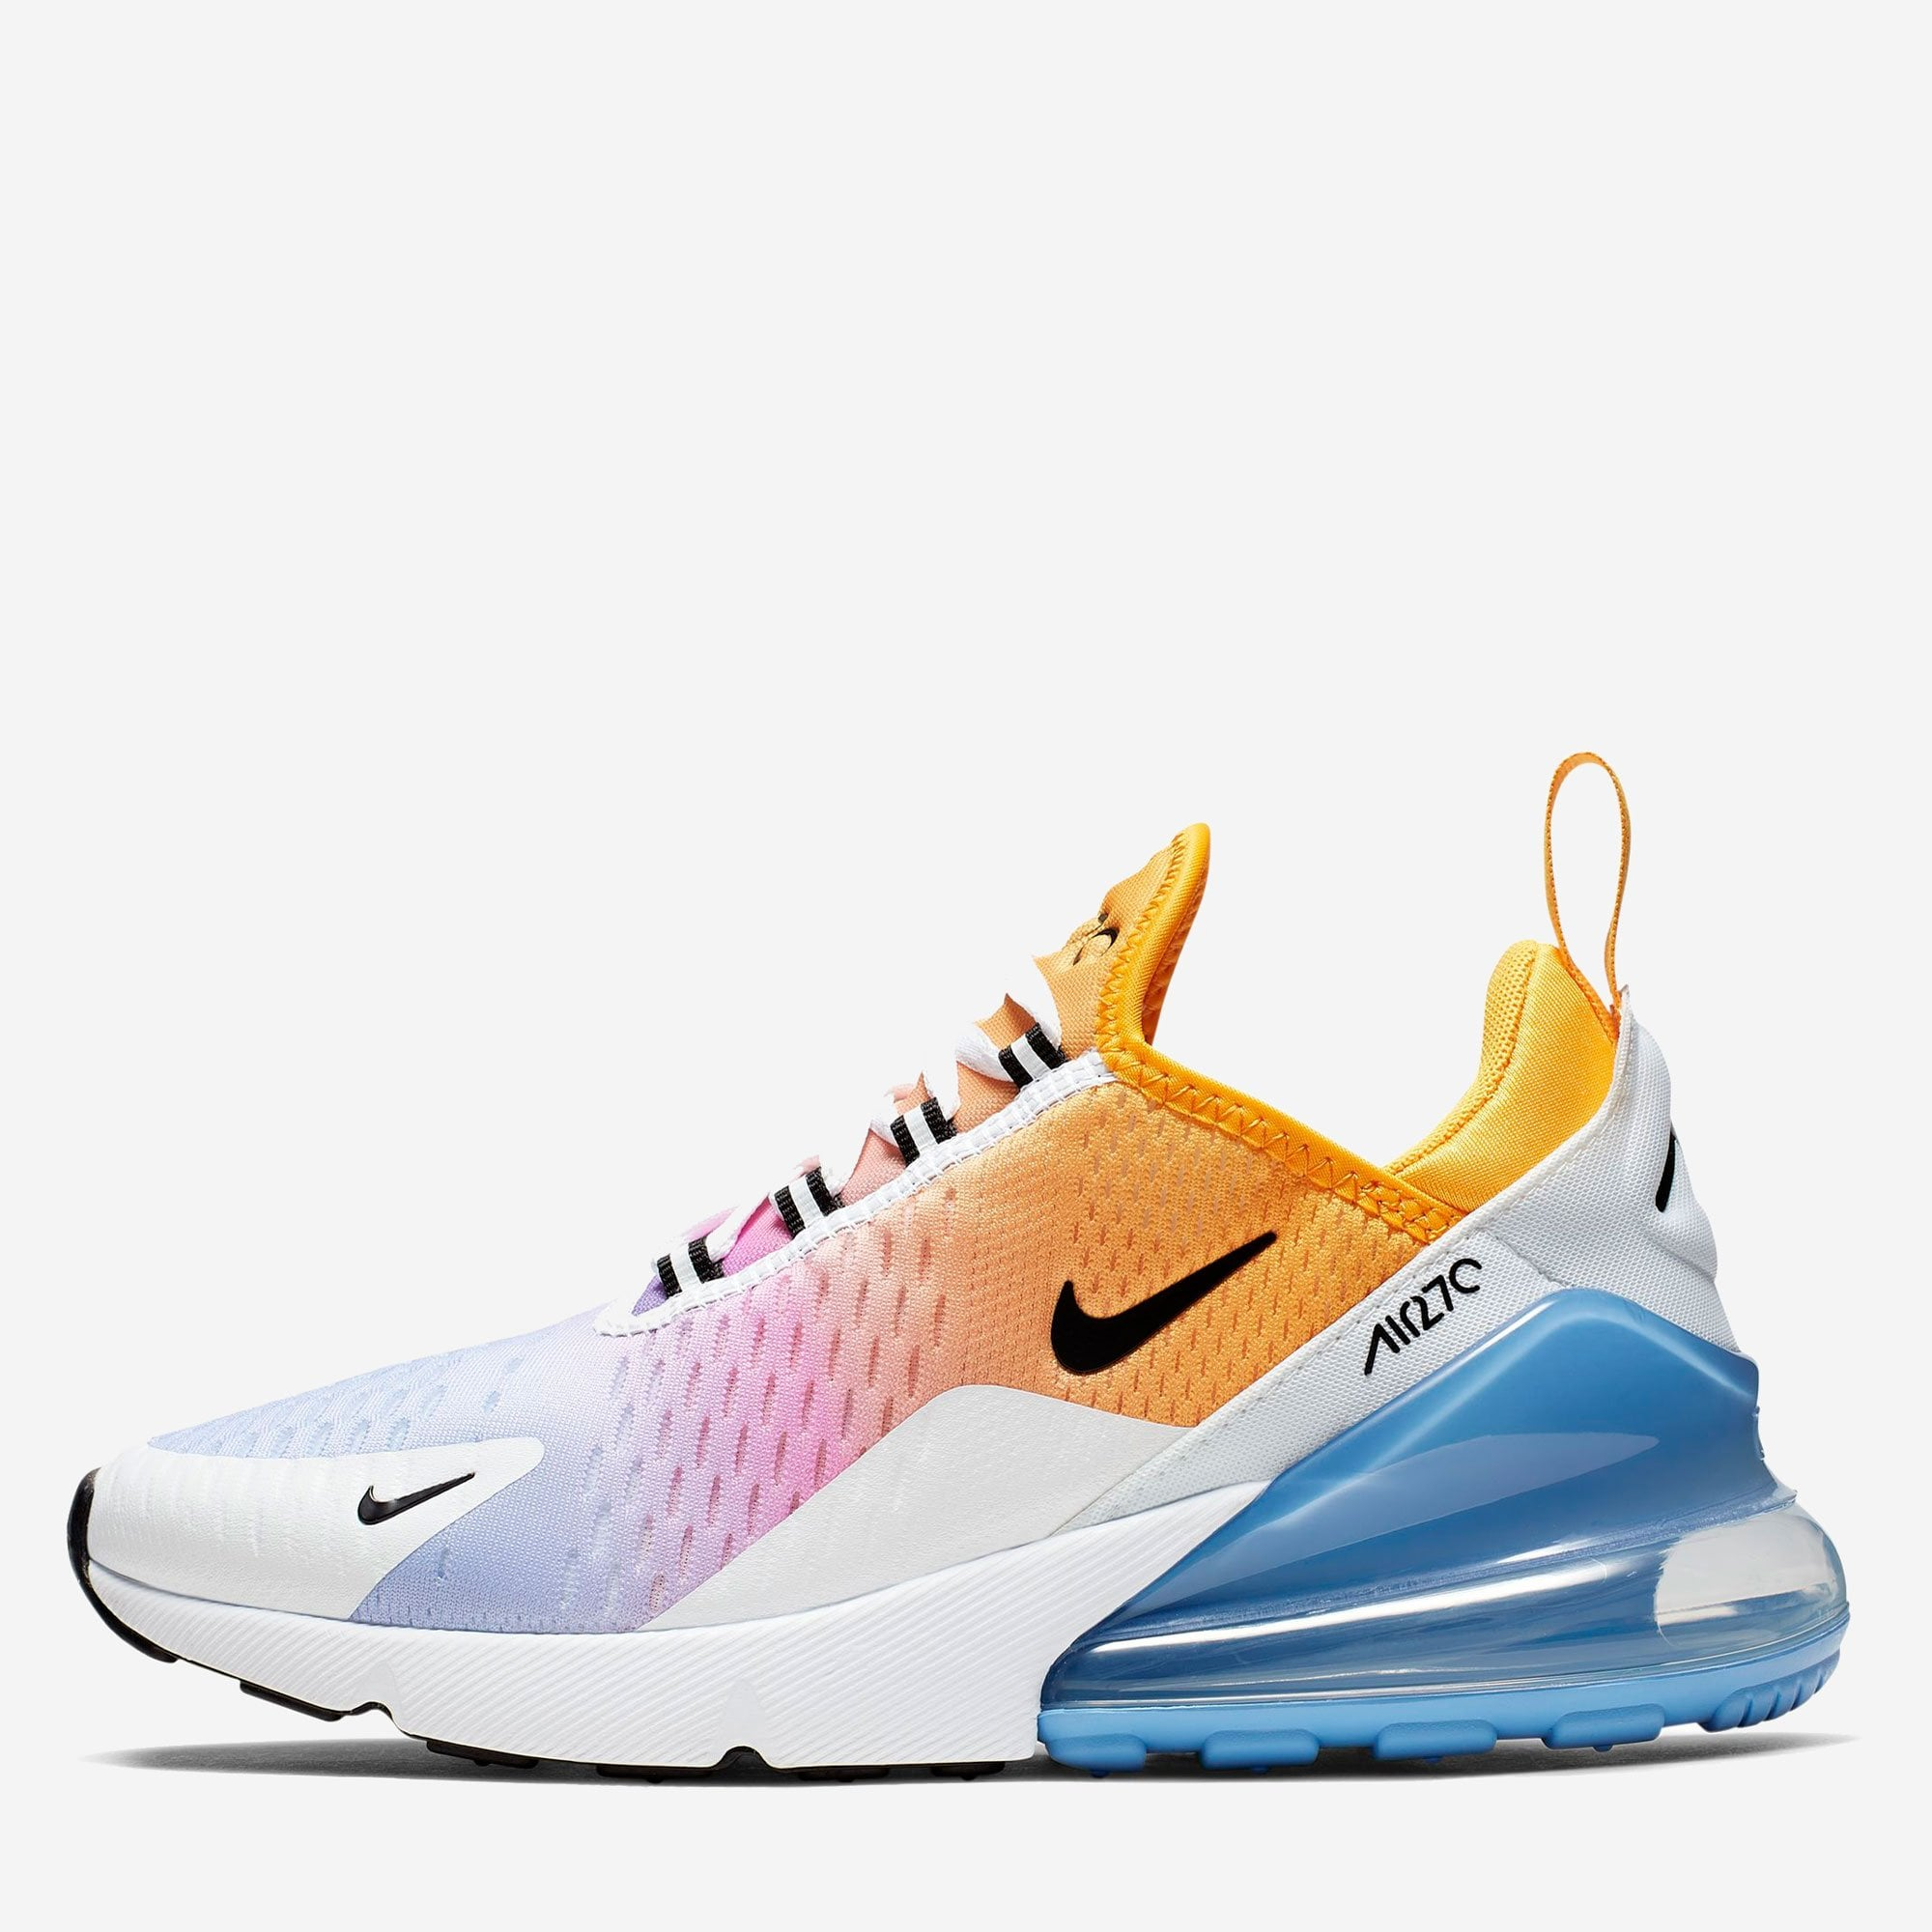 Nike Air Max 270 - Womens Footwear